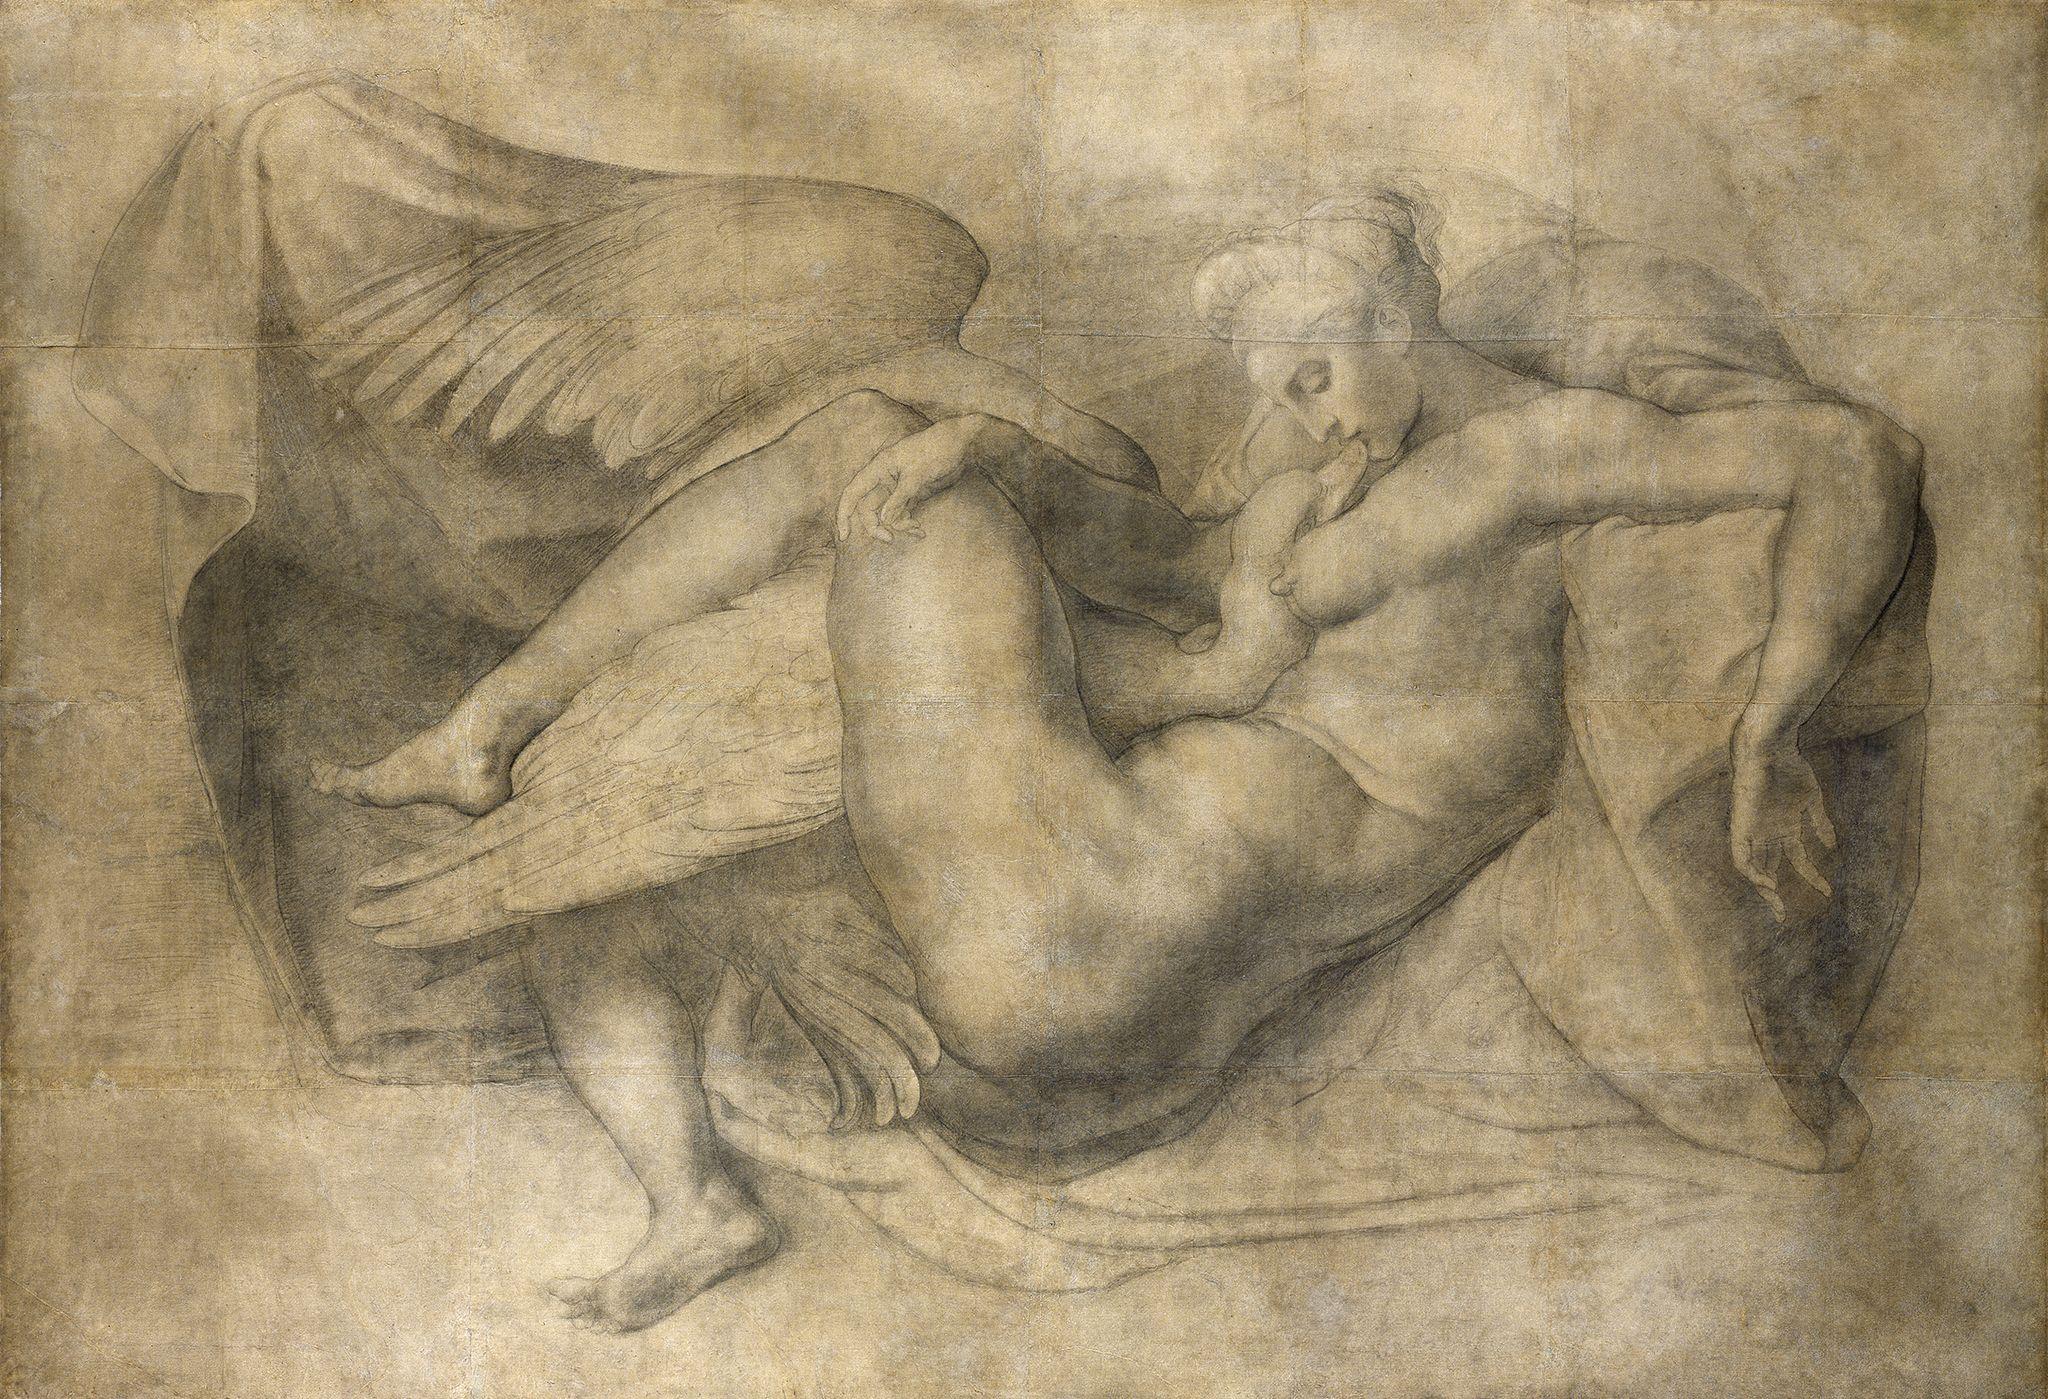 Copia da Michelangelo